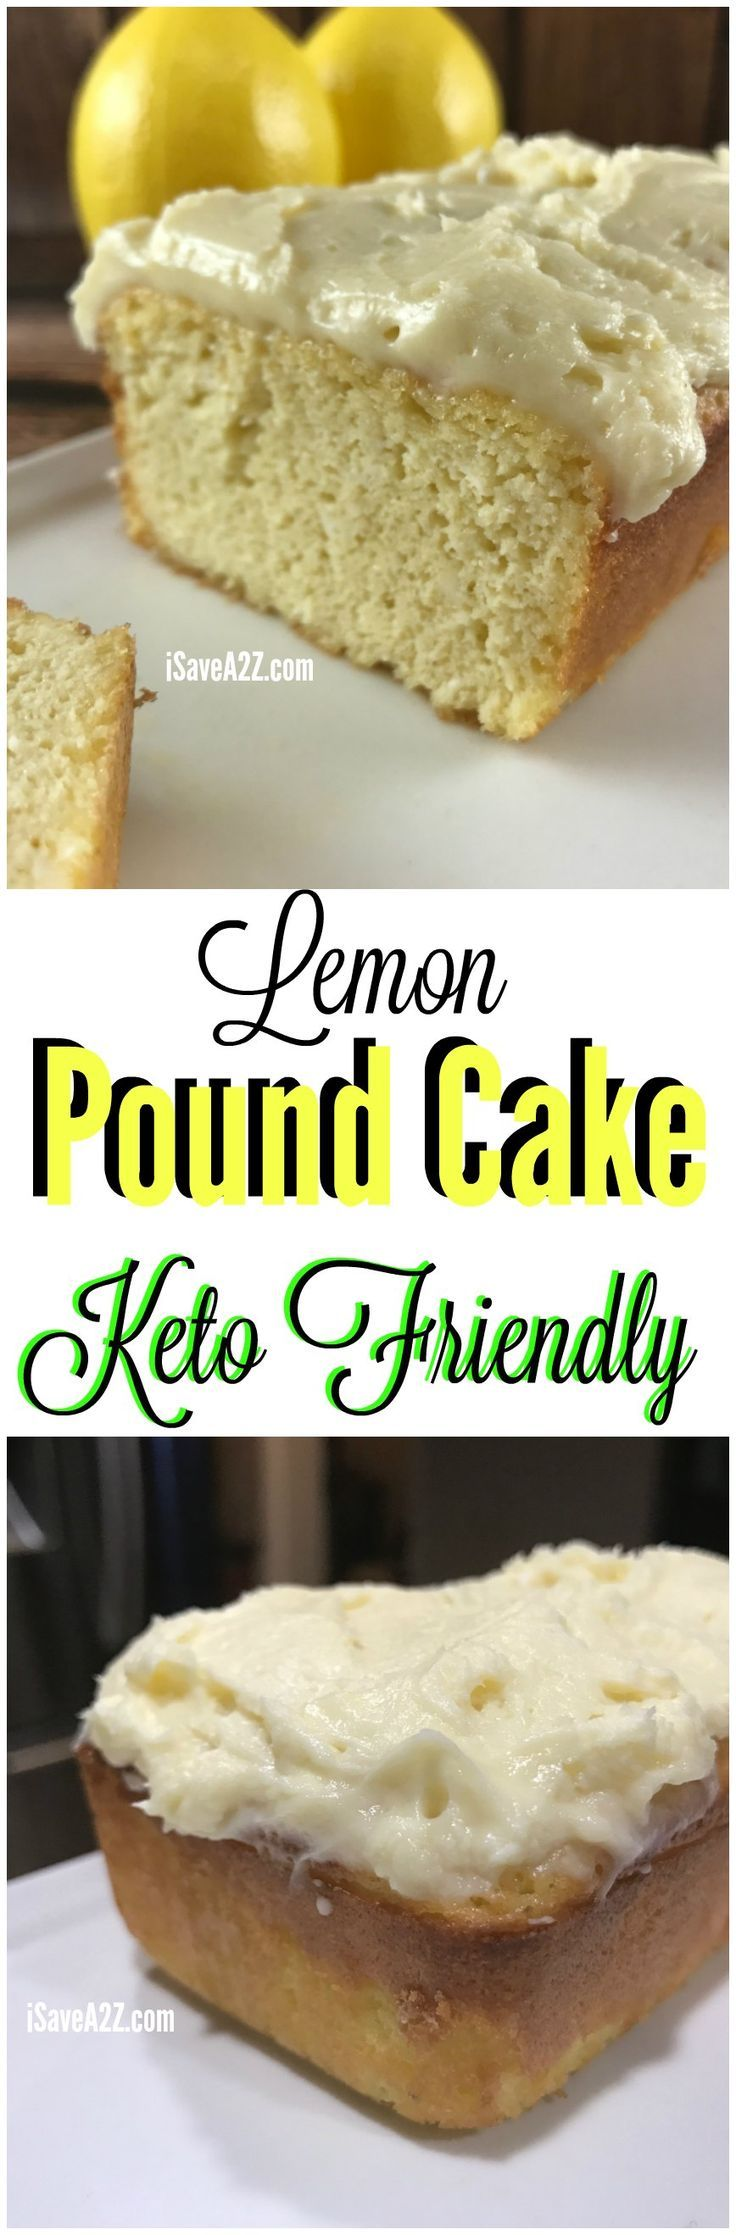 Carb Quick Lemon Pound Cake